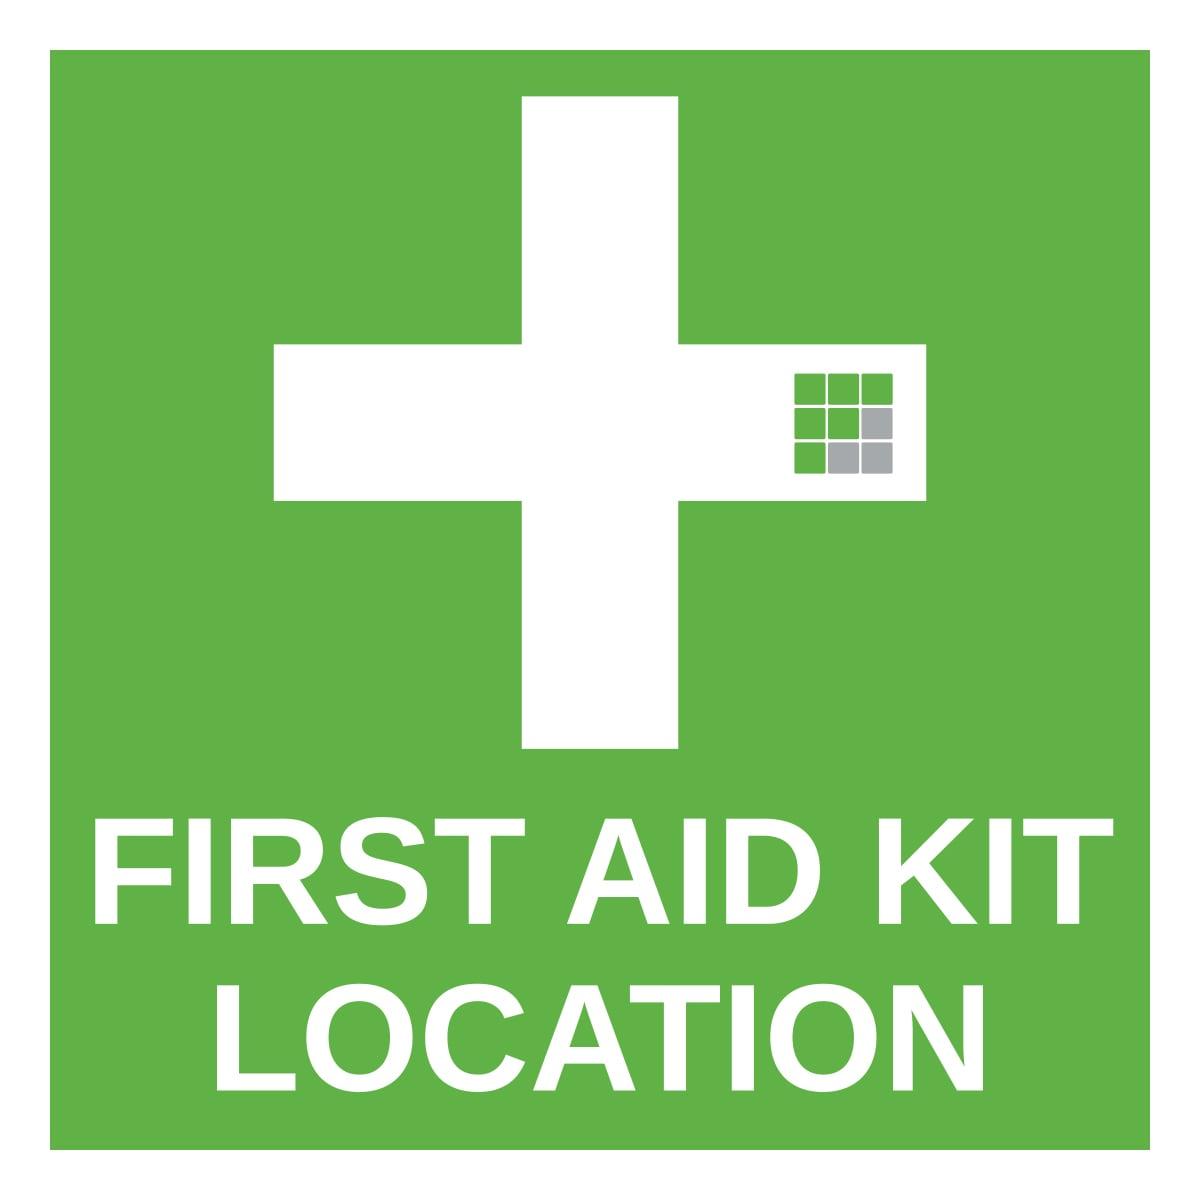 first aid kit location - 1x1ft.jpg